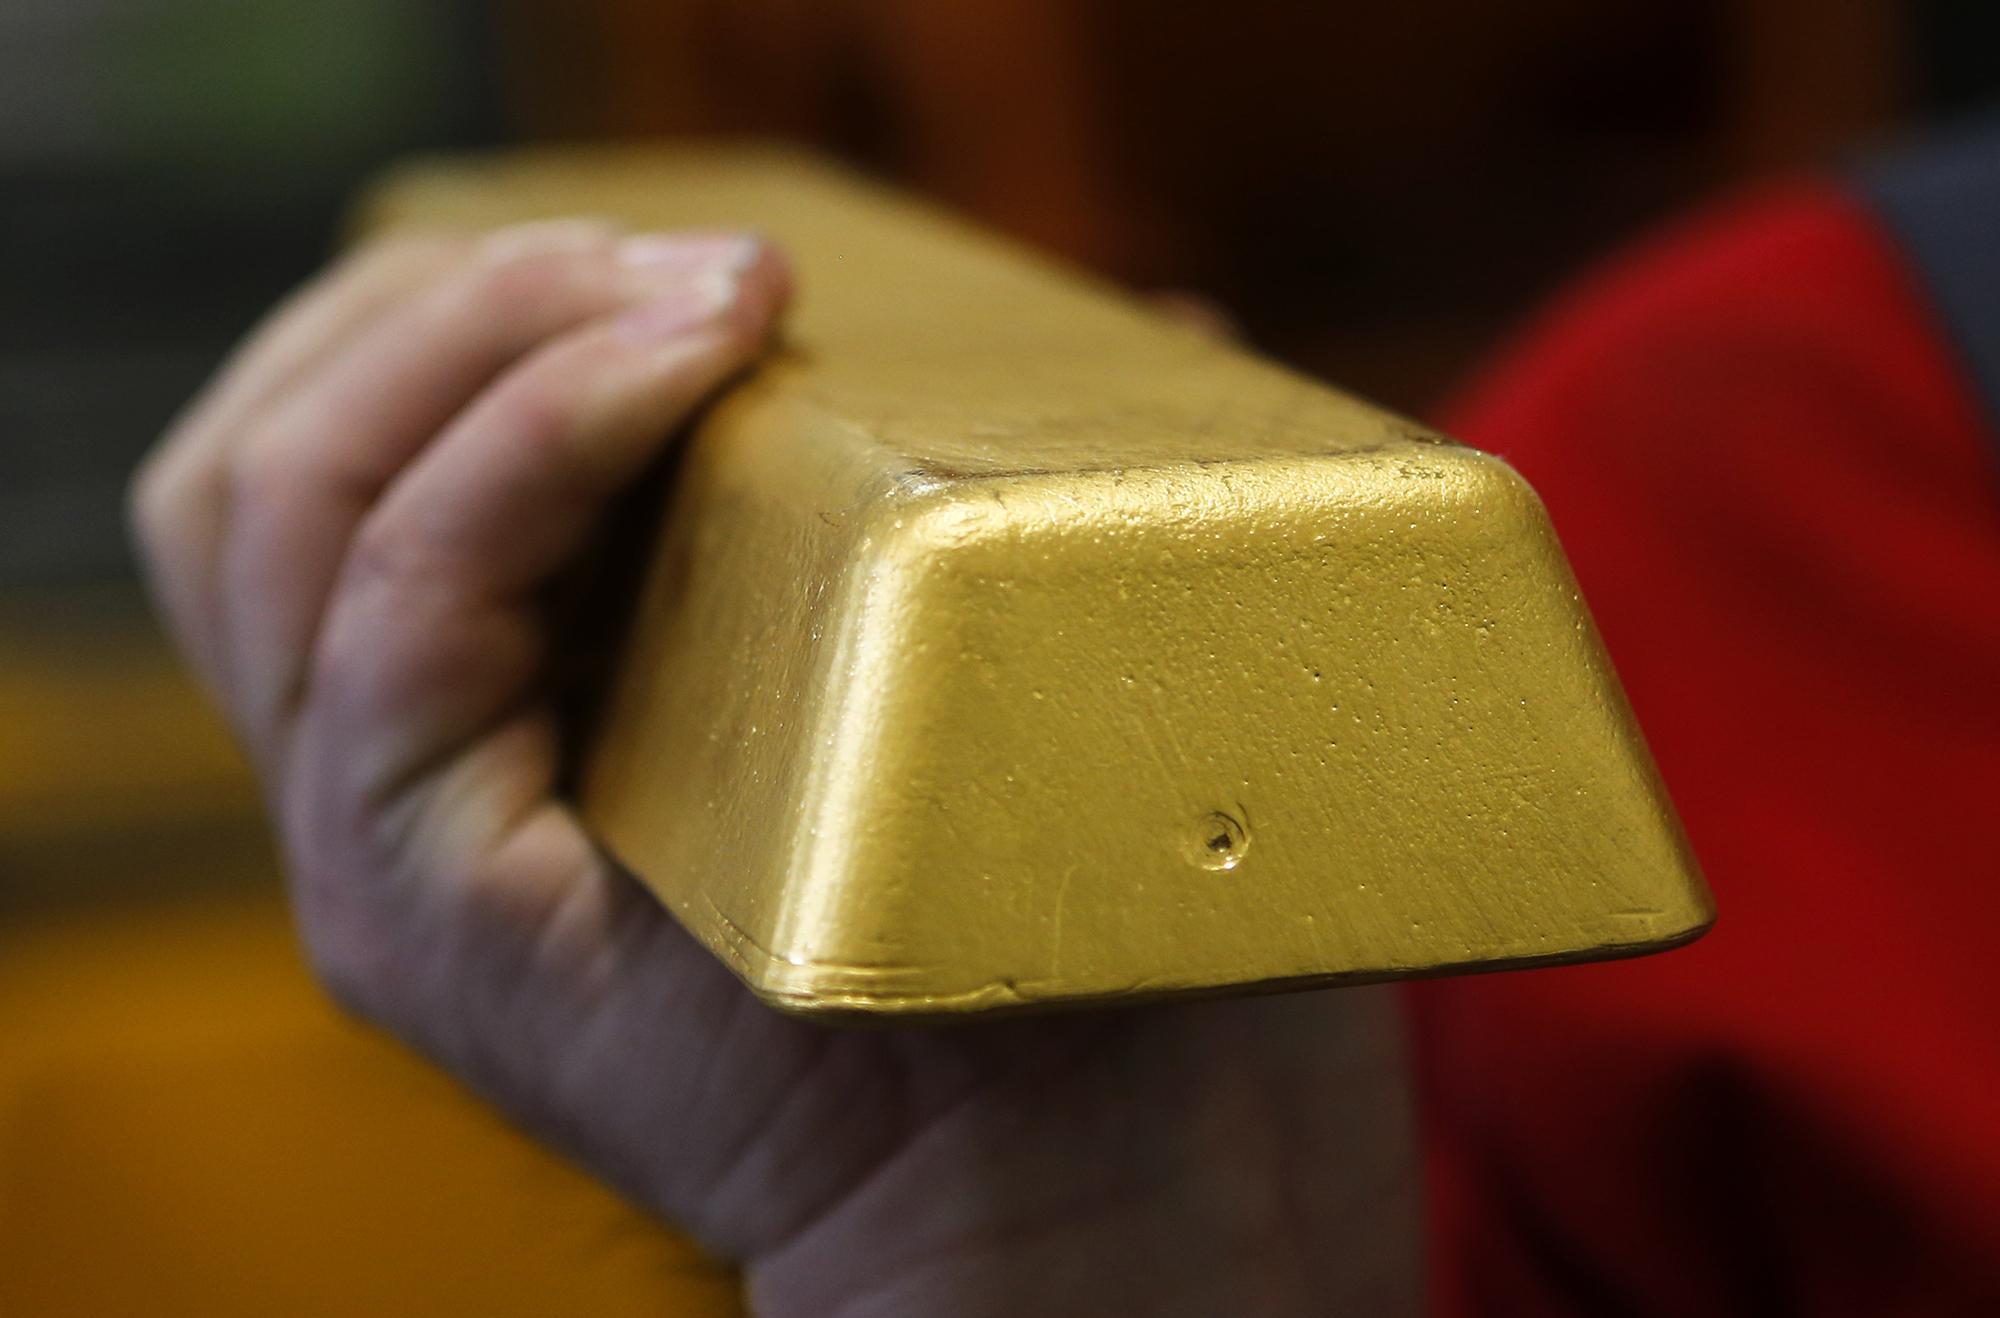 килограмм золота картинка девушка аппетитными сиськами